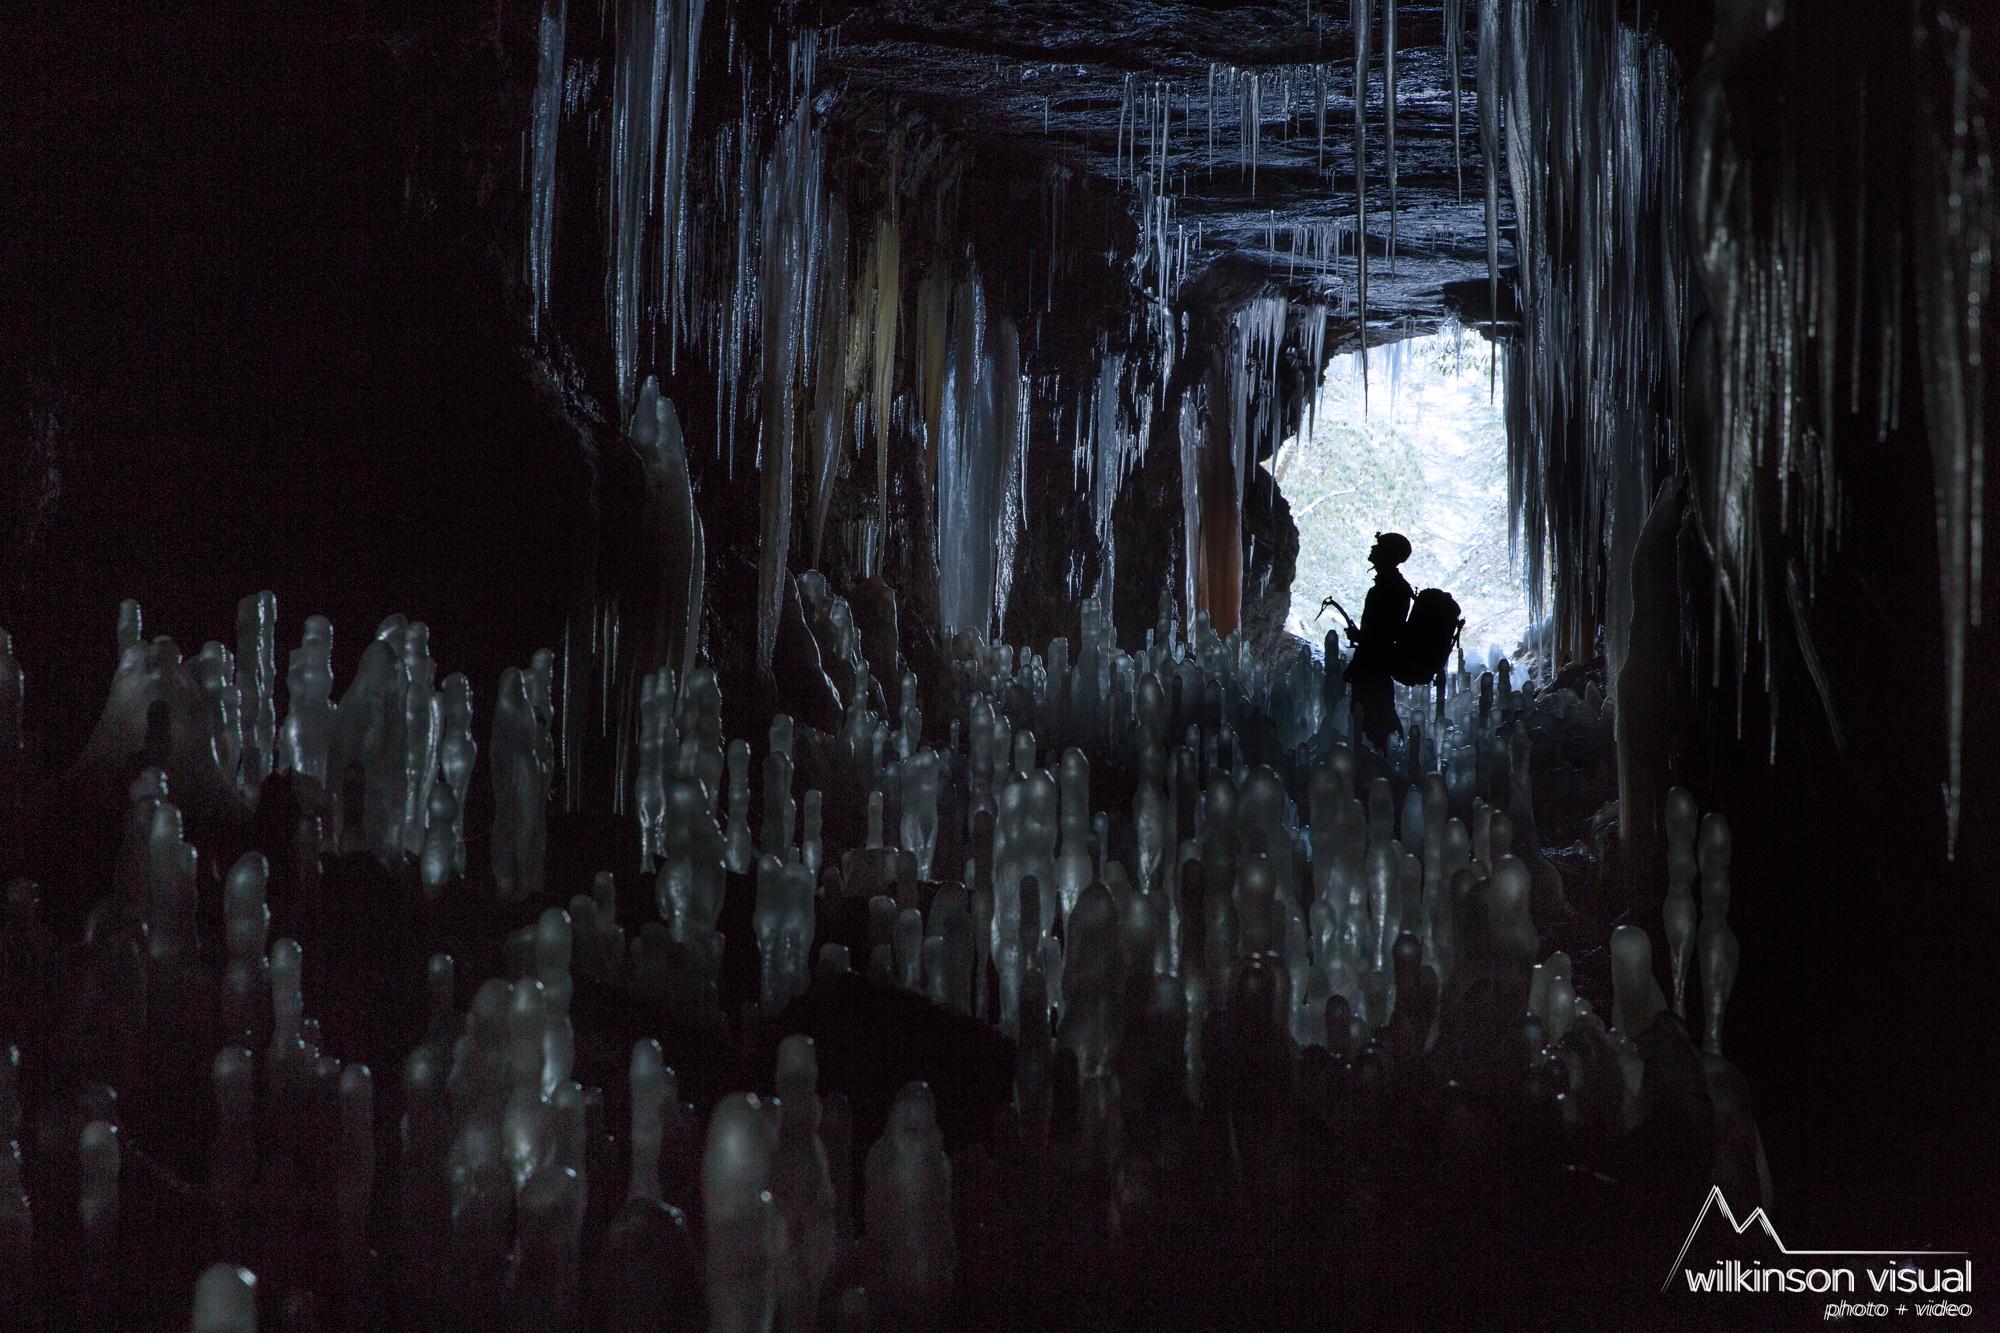 Erik Kloeker in an ice cave in Kentucky.